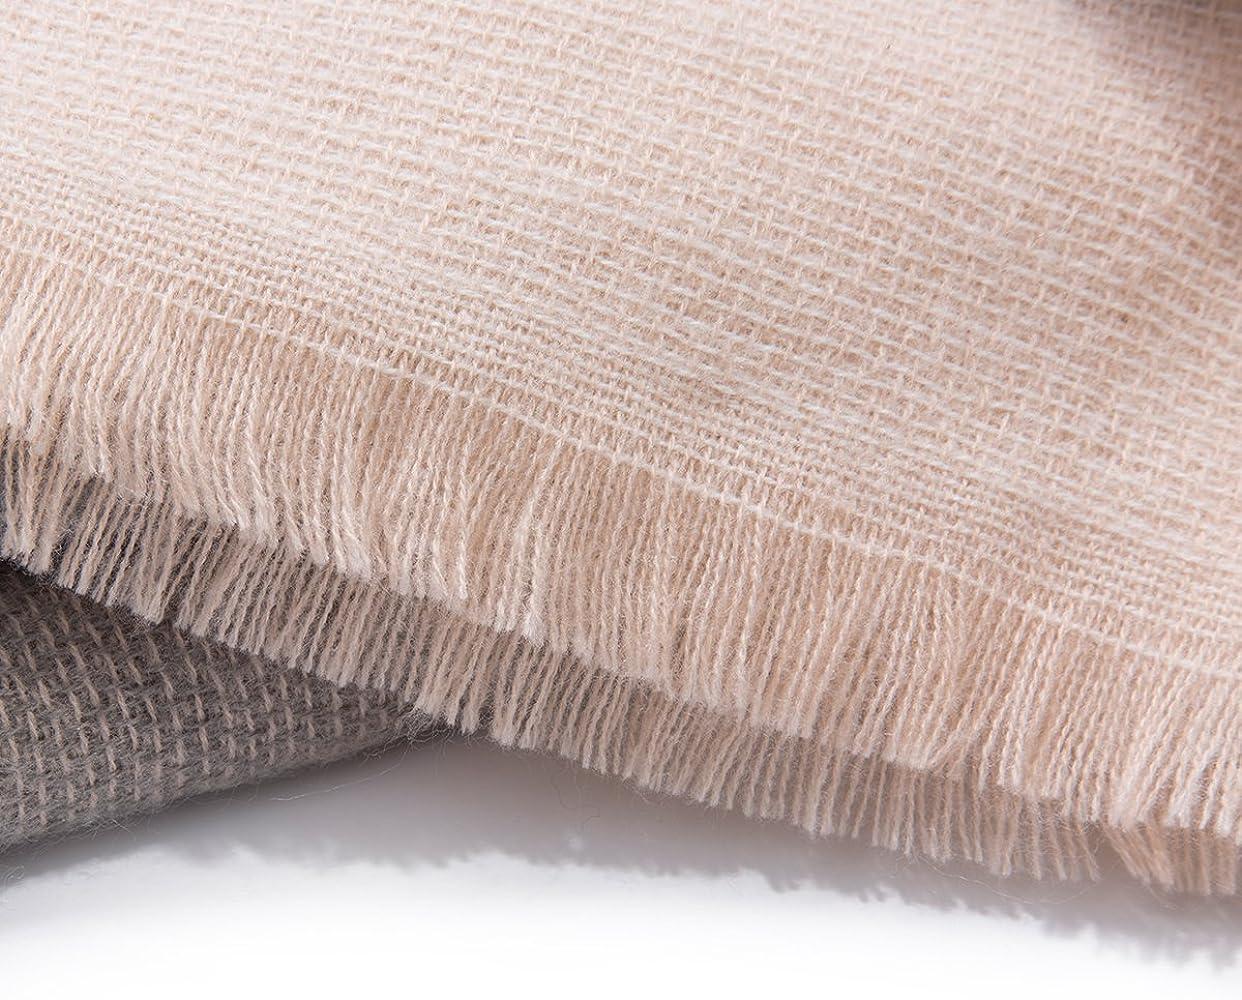 Flowomen Oversized Blanket Scarf Plaid Shawl Fashion Wrap Chunky Lightweight Warm Soft Tassel